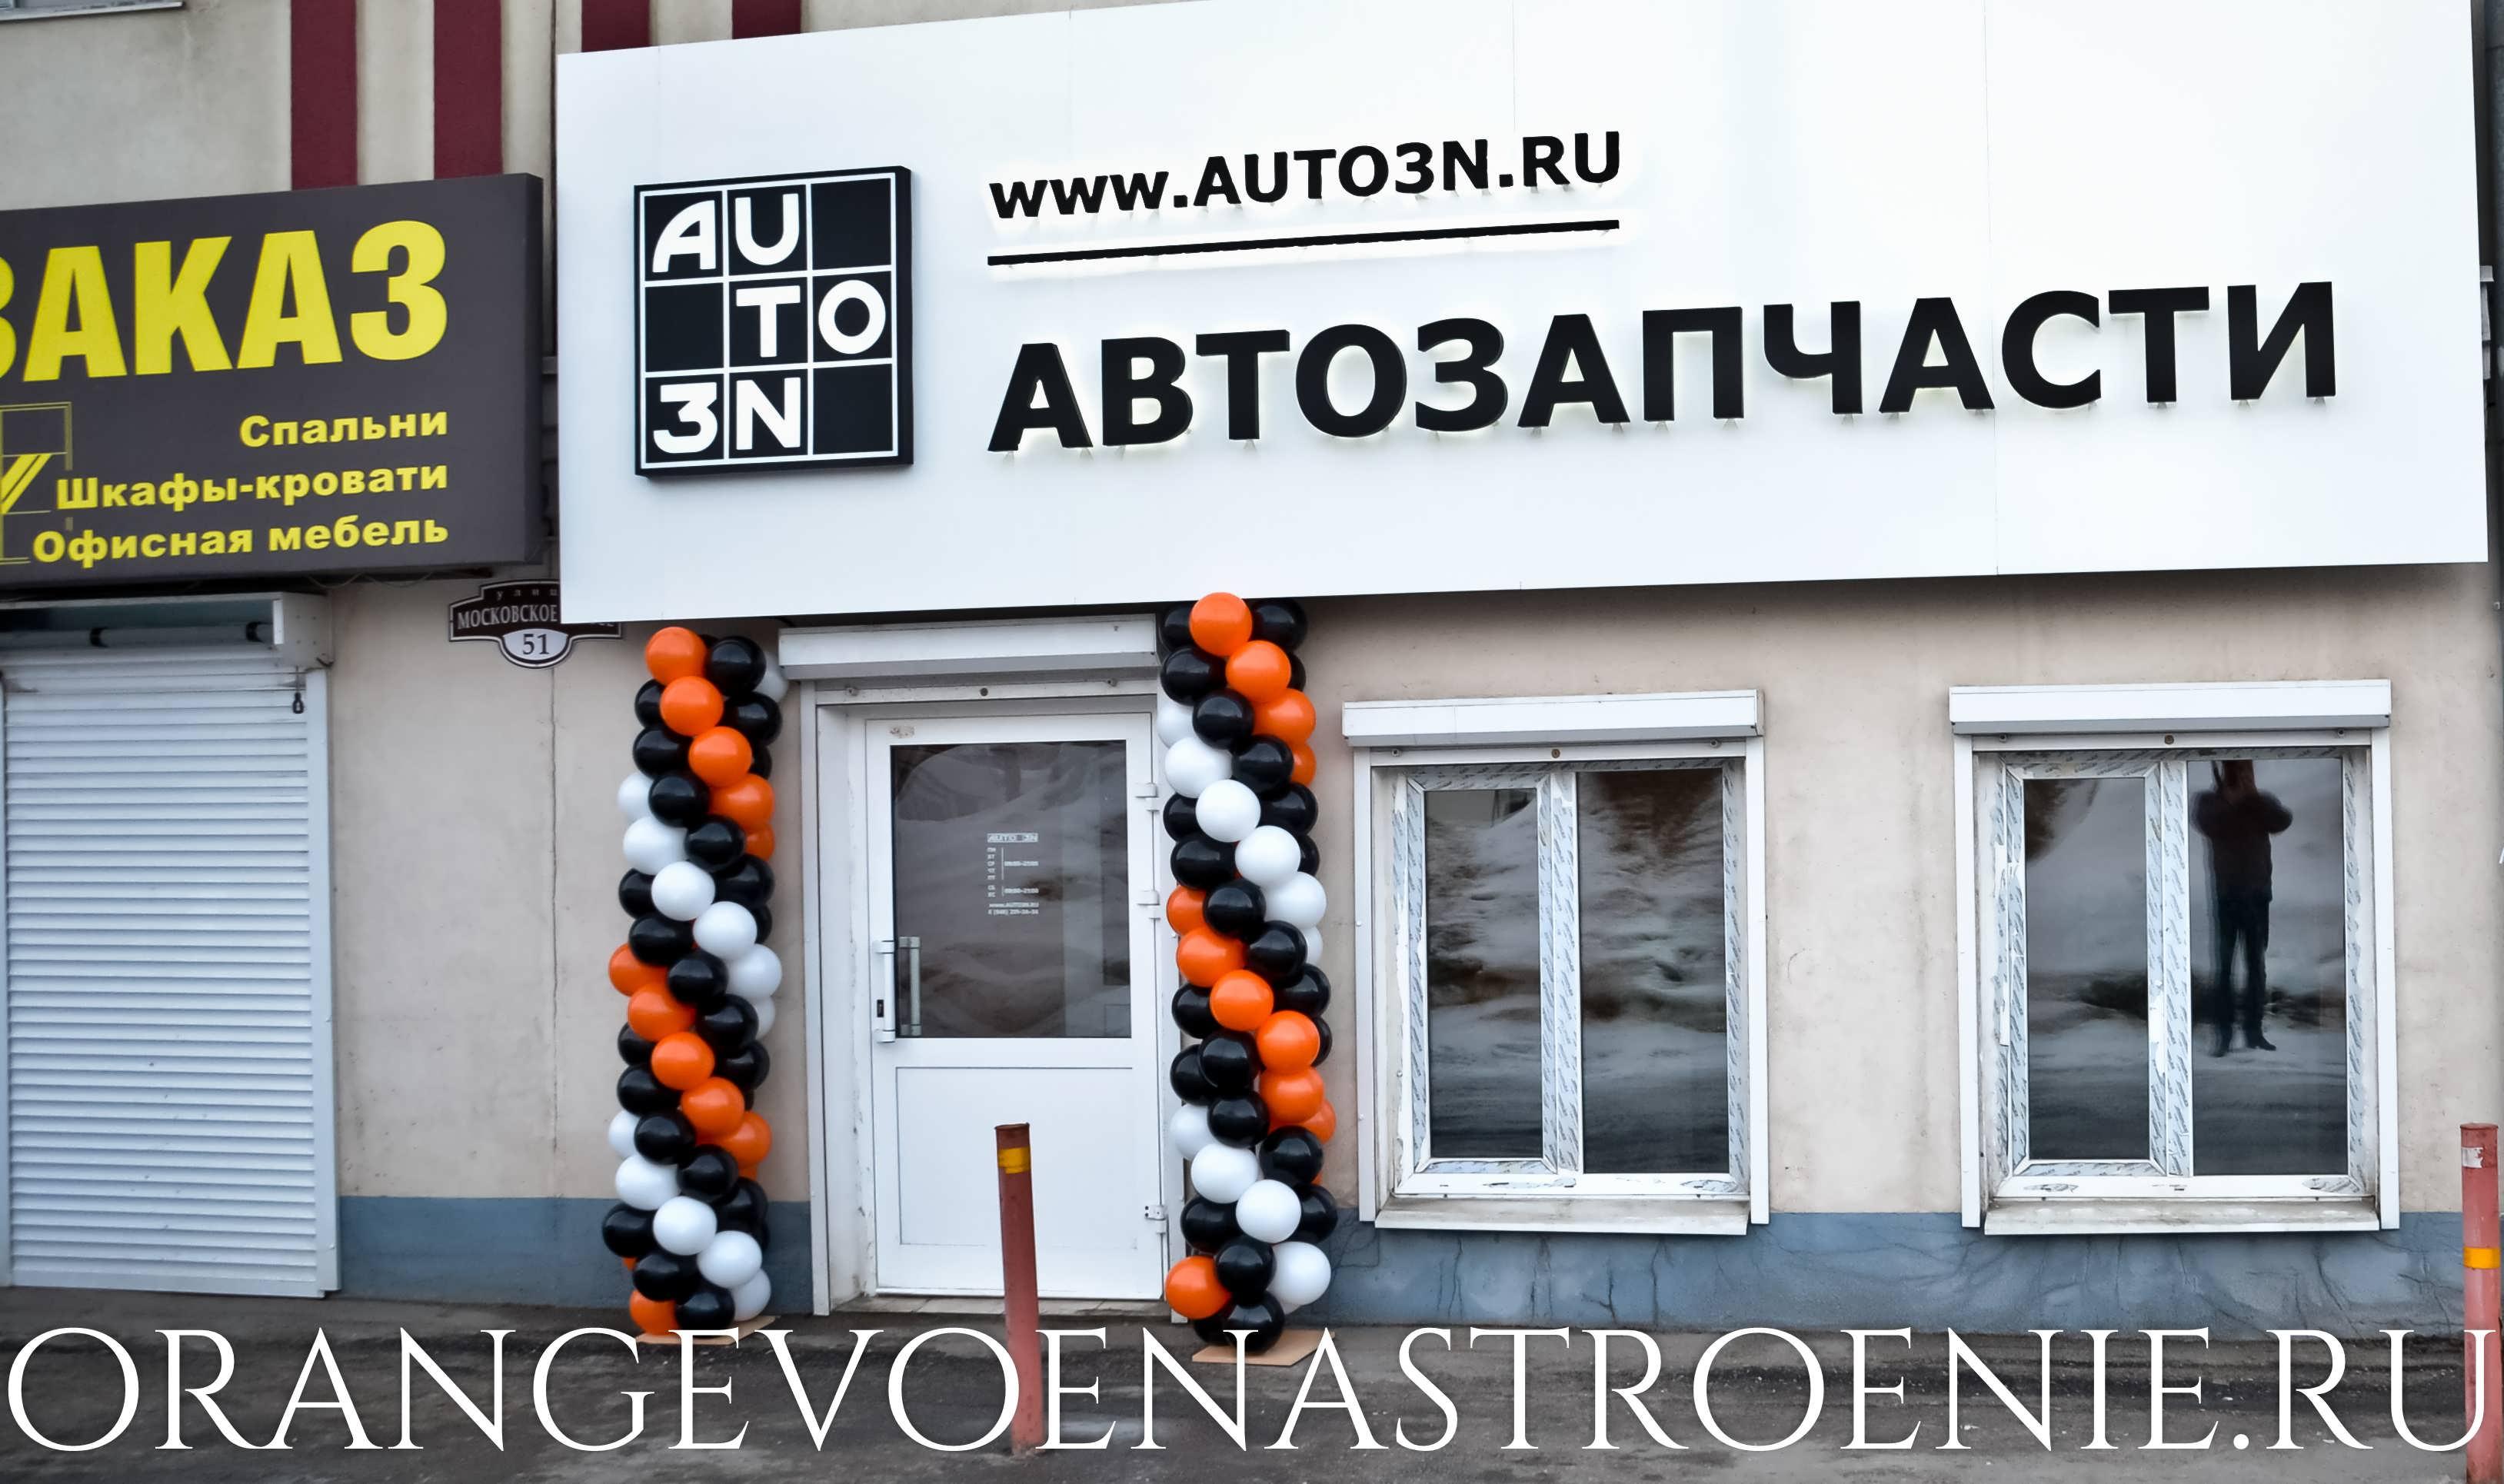 Украшение шарами магазина Auto3n